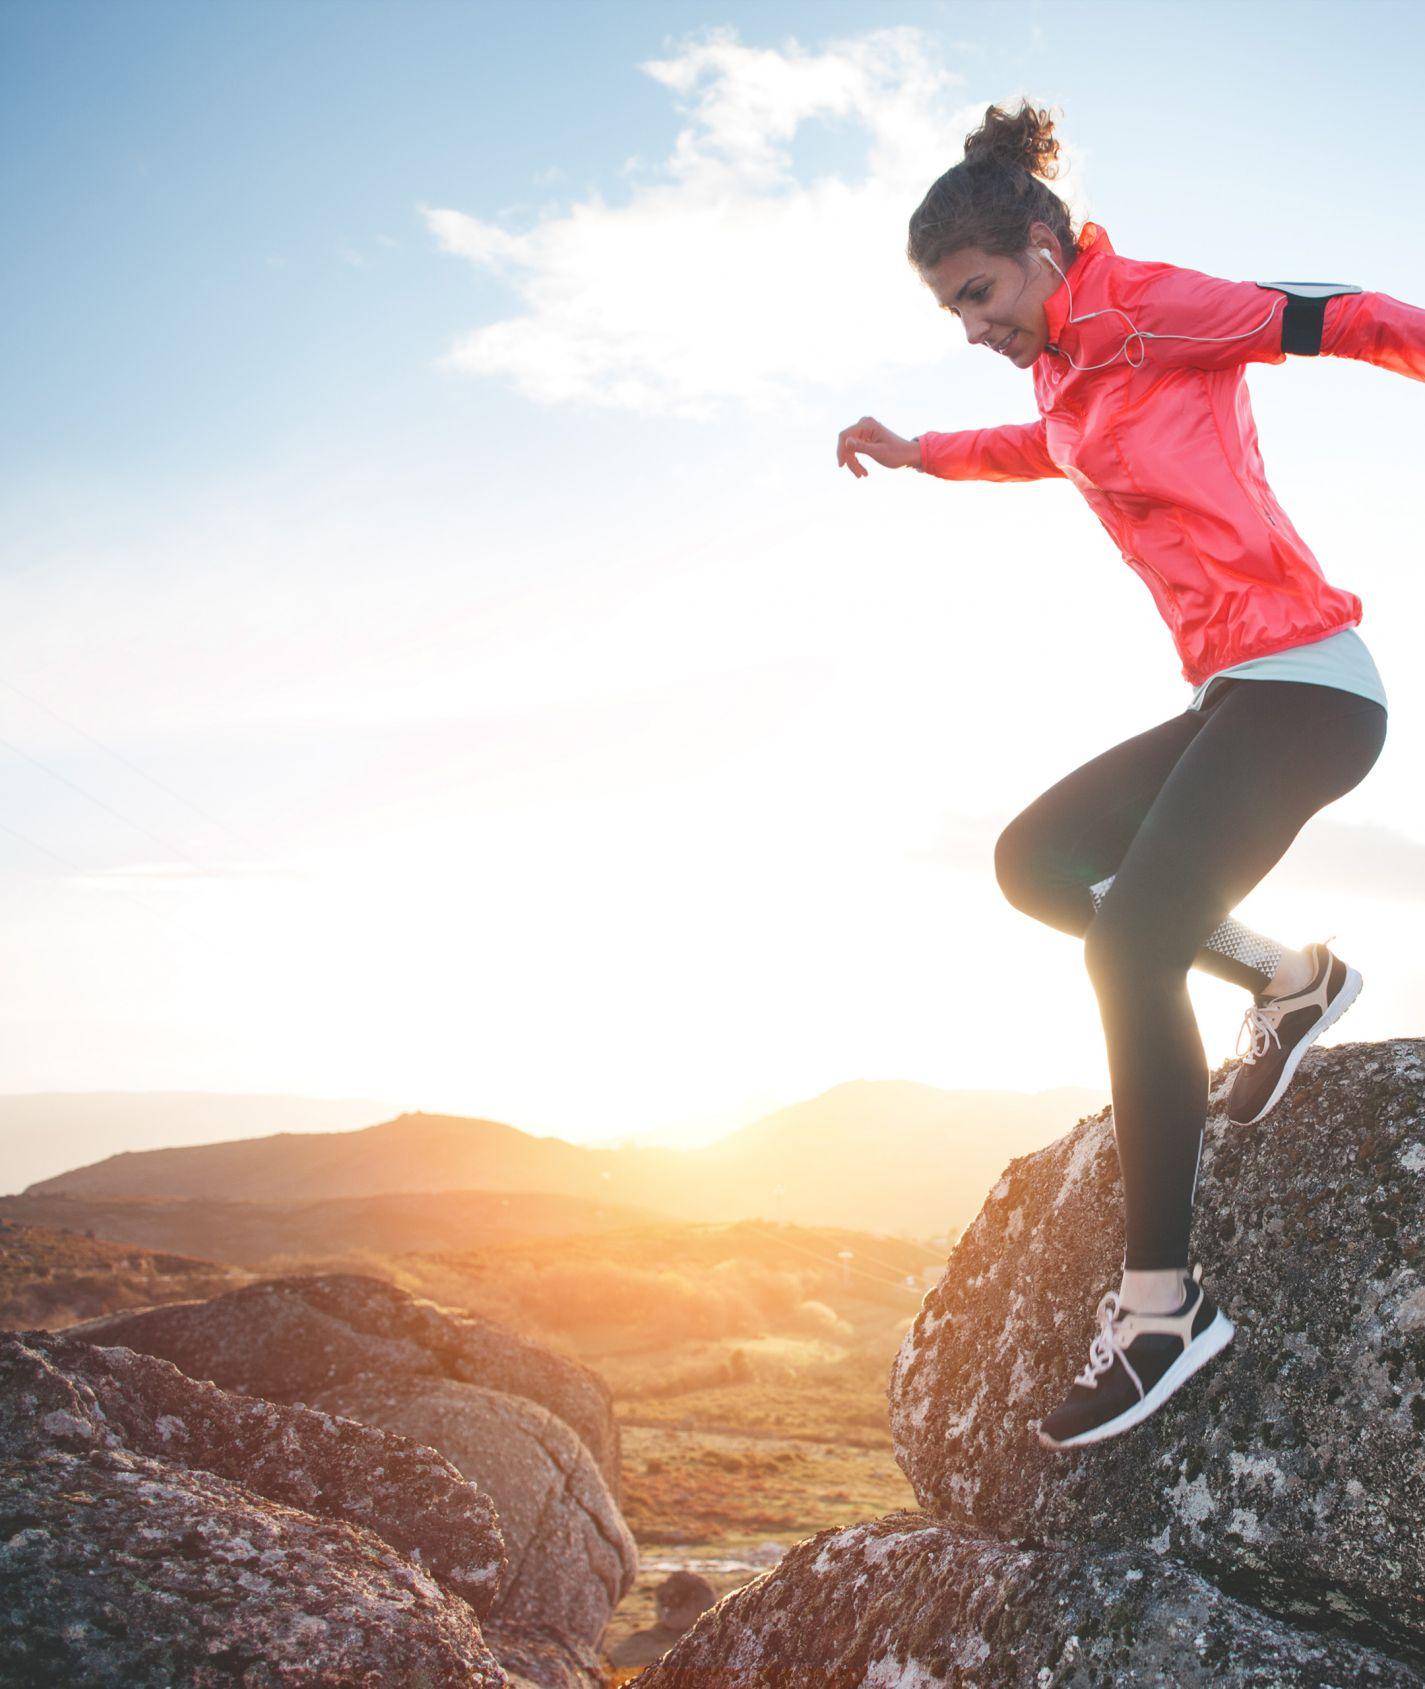 junge Frau mit pinker Jacke und schwarzer Sportleggings klettert in den Bergen